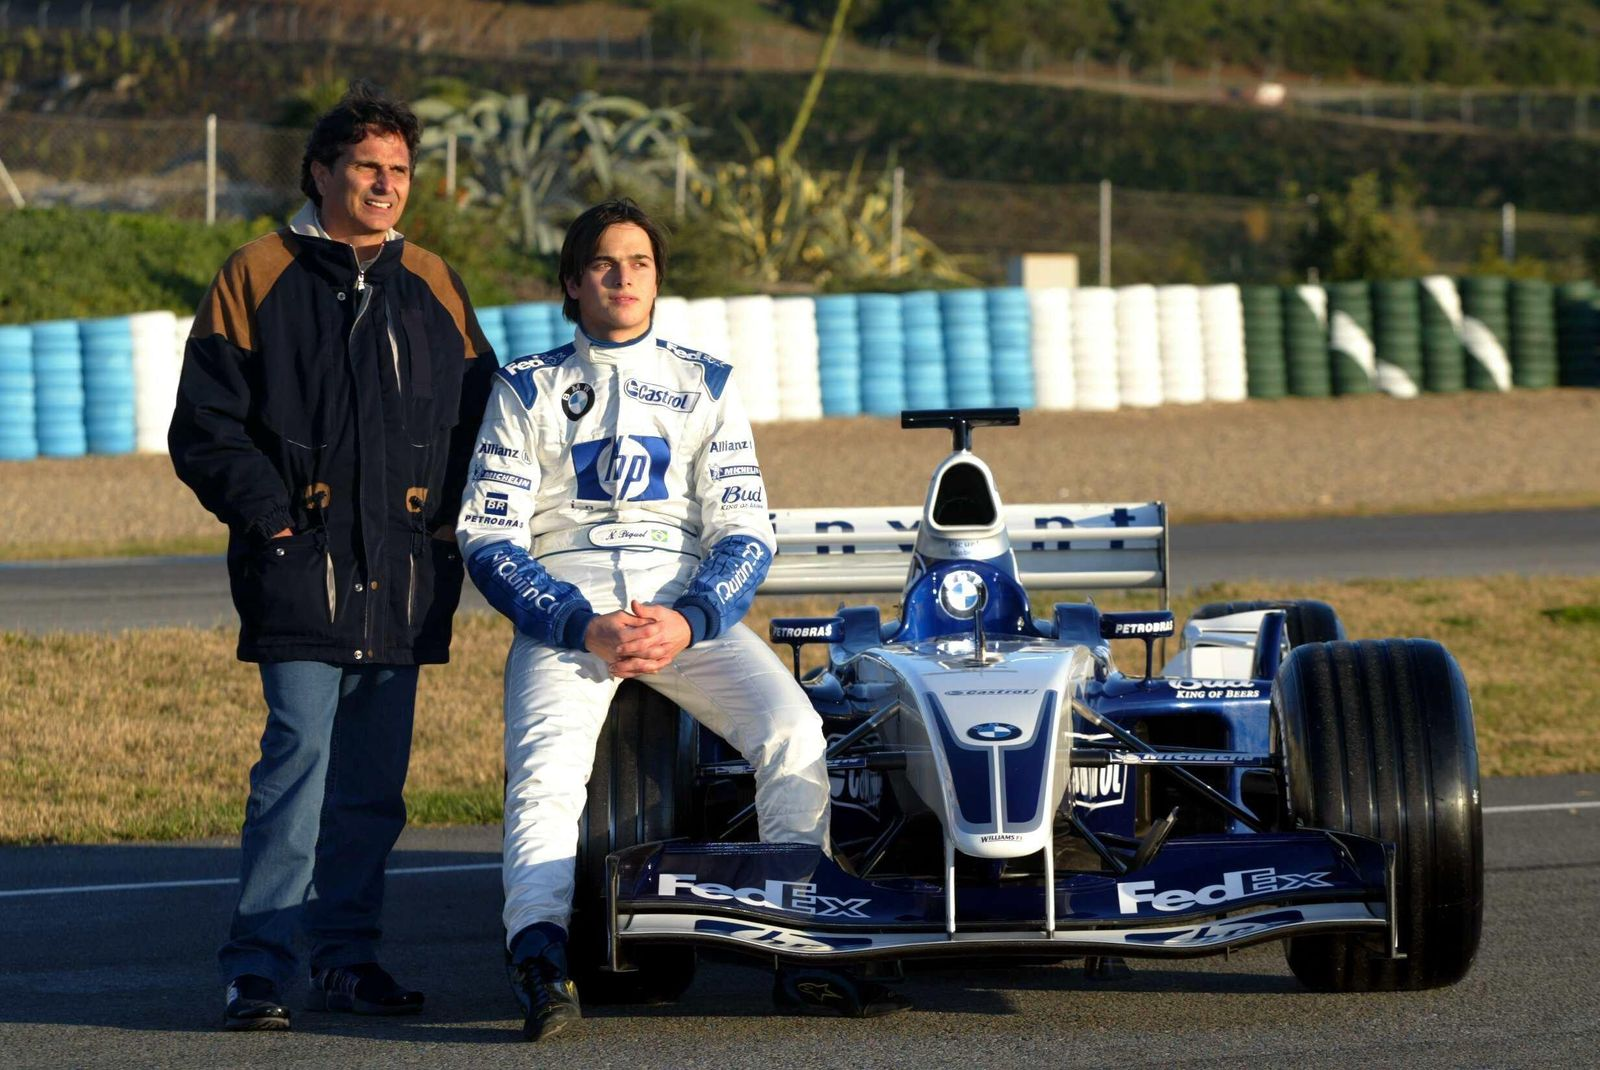 L to R Nelson Piquet BRA and his son Nelson Piquet Jnr BRA Williams BMW FW25 Formula One Test